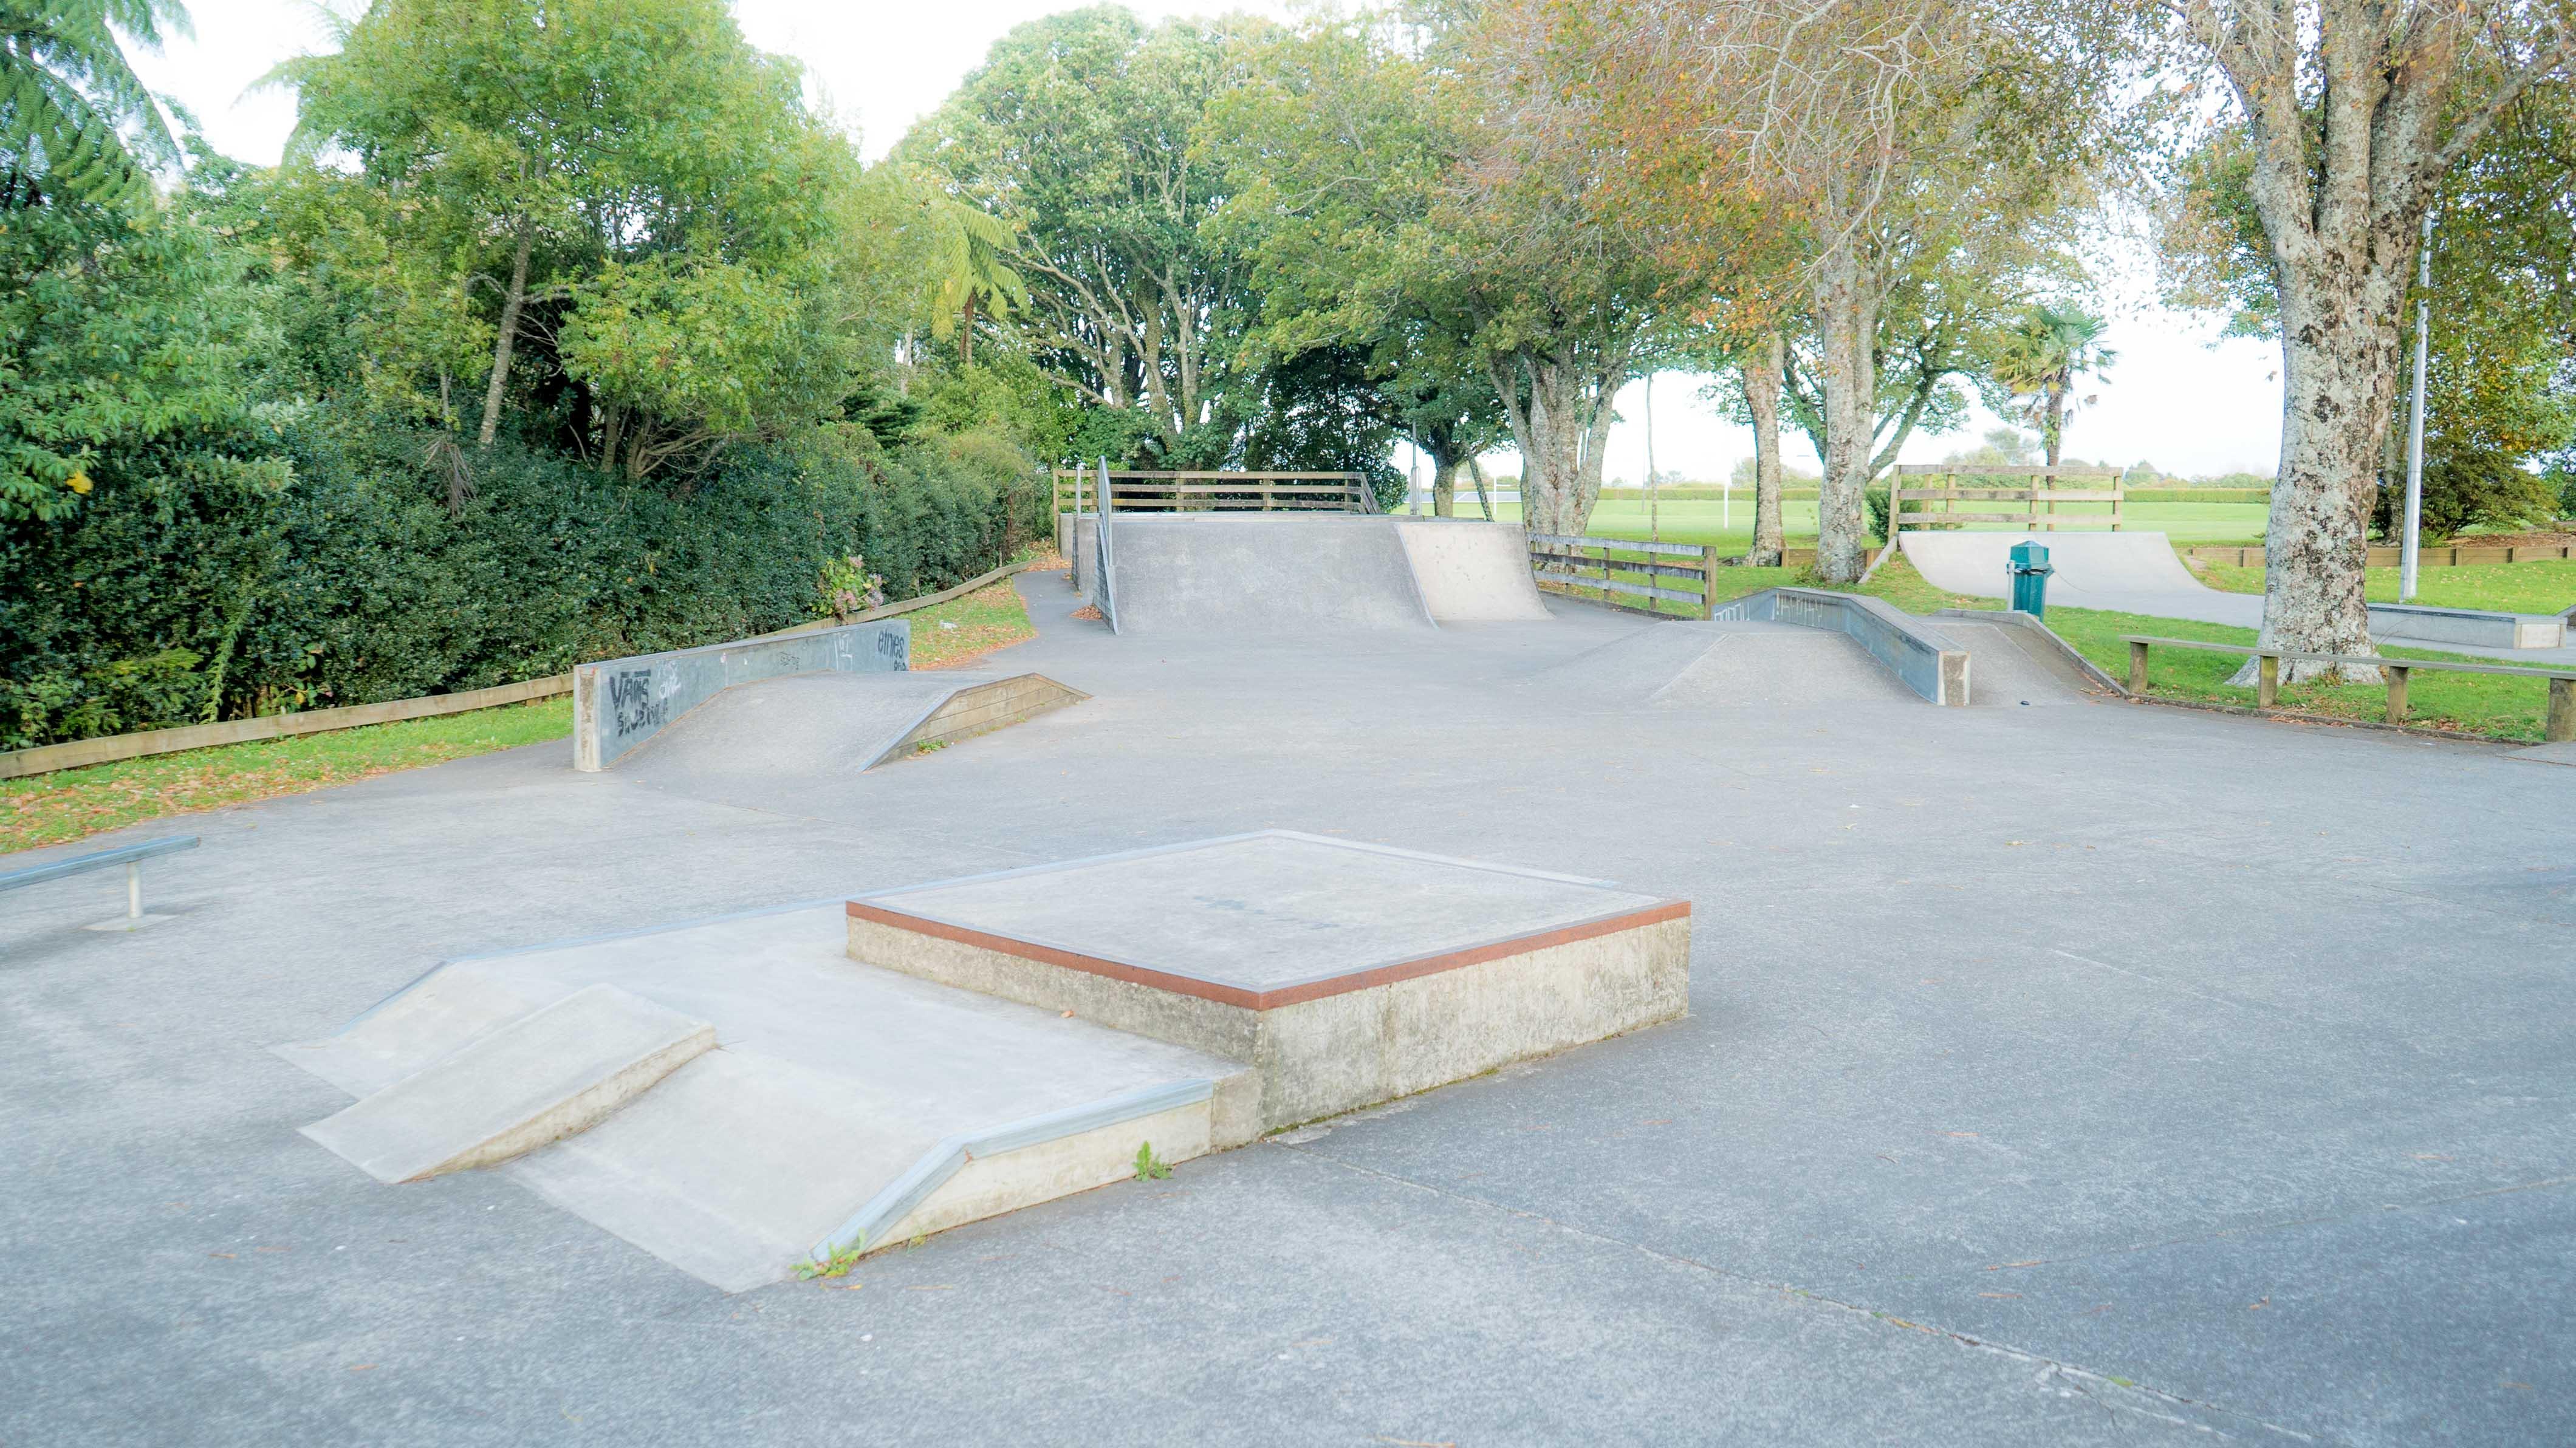 Stratford Skatepark